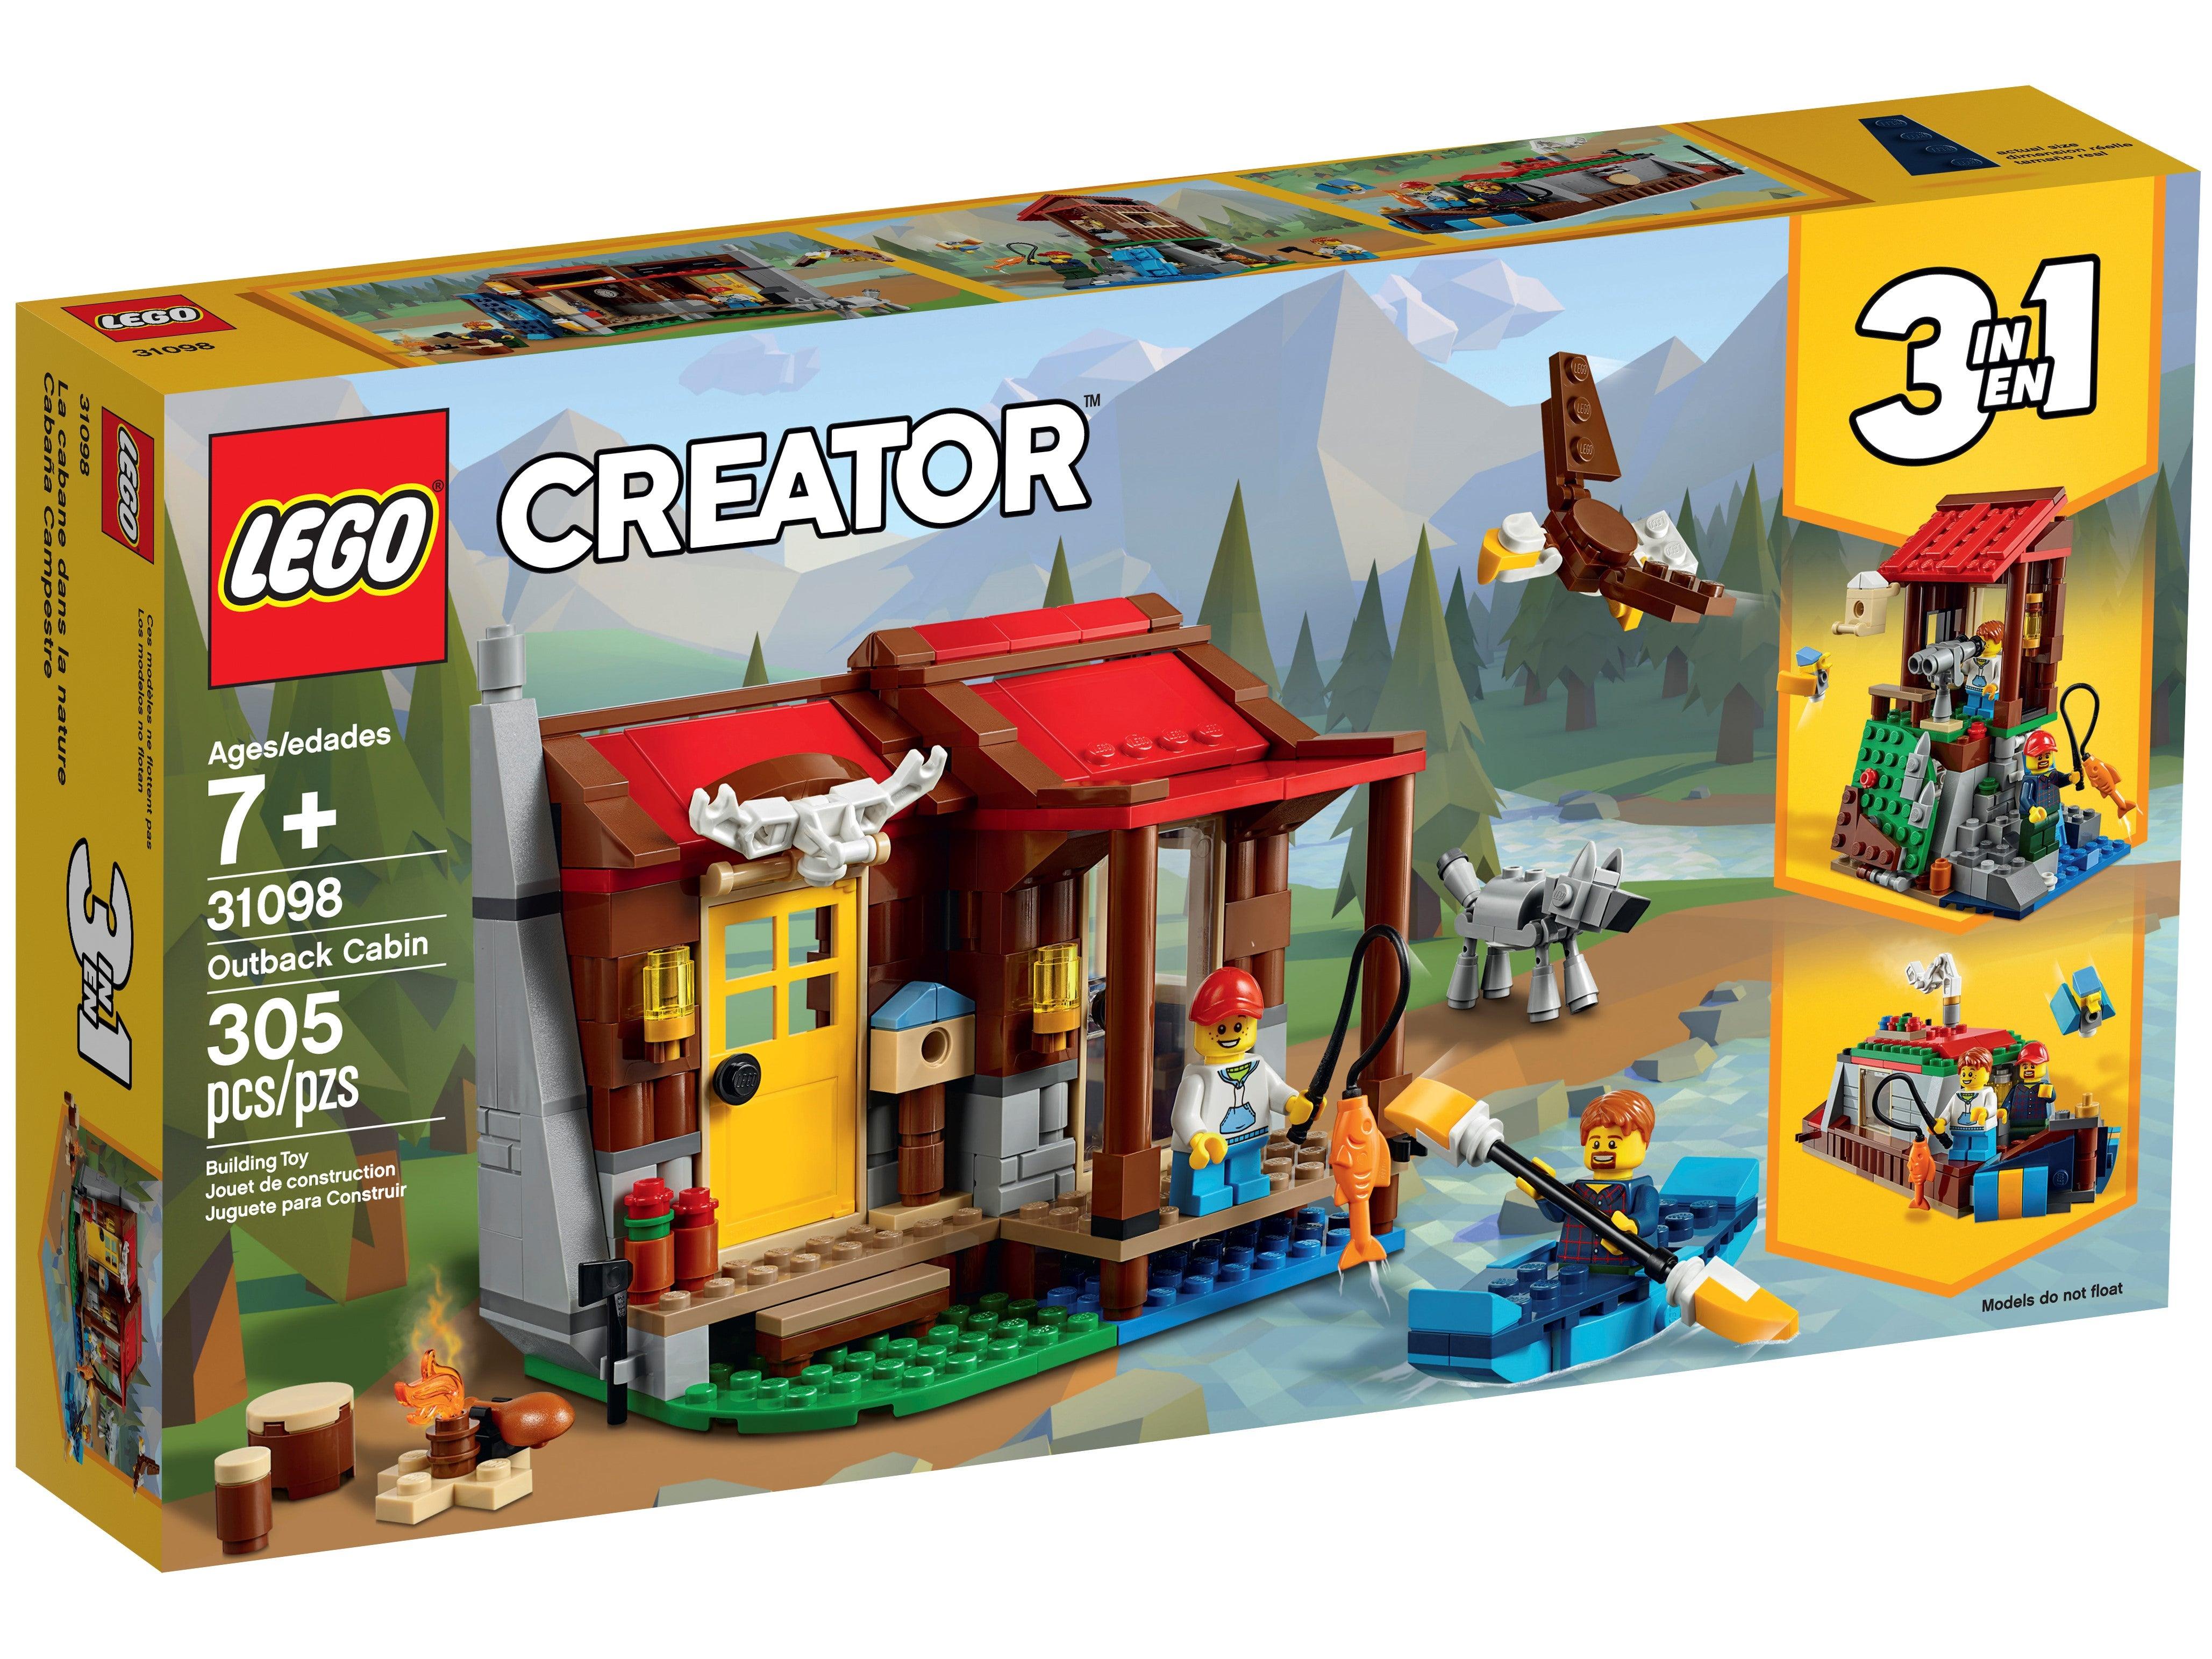 Outback Cabin 31098 LEGO Creator